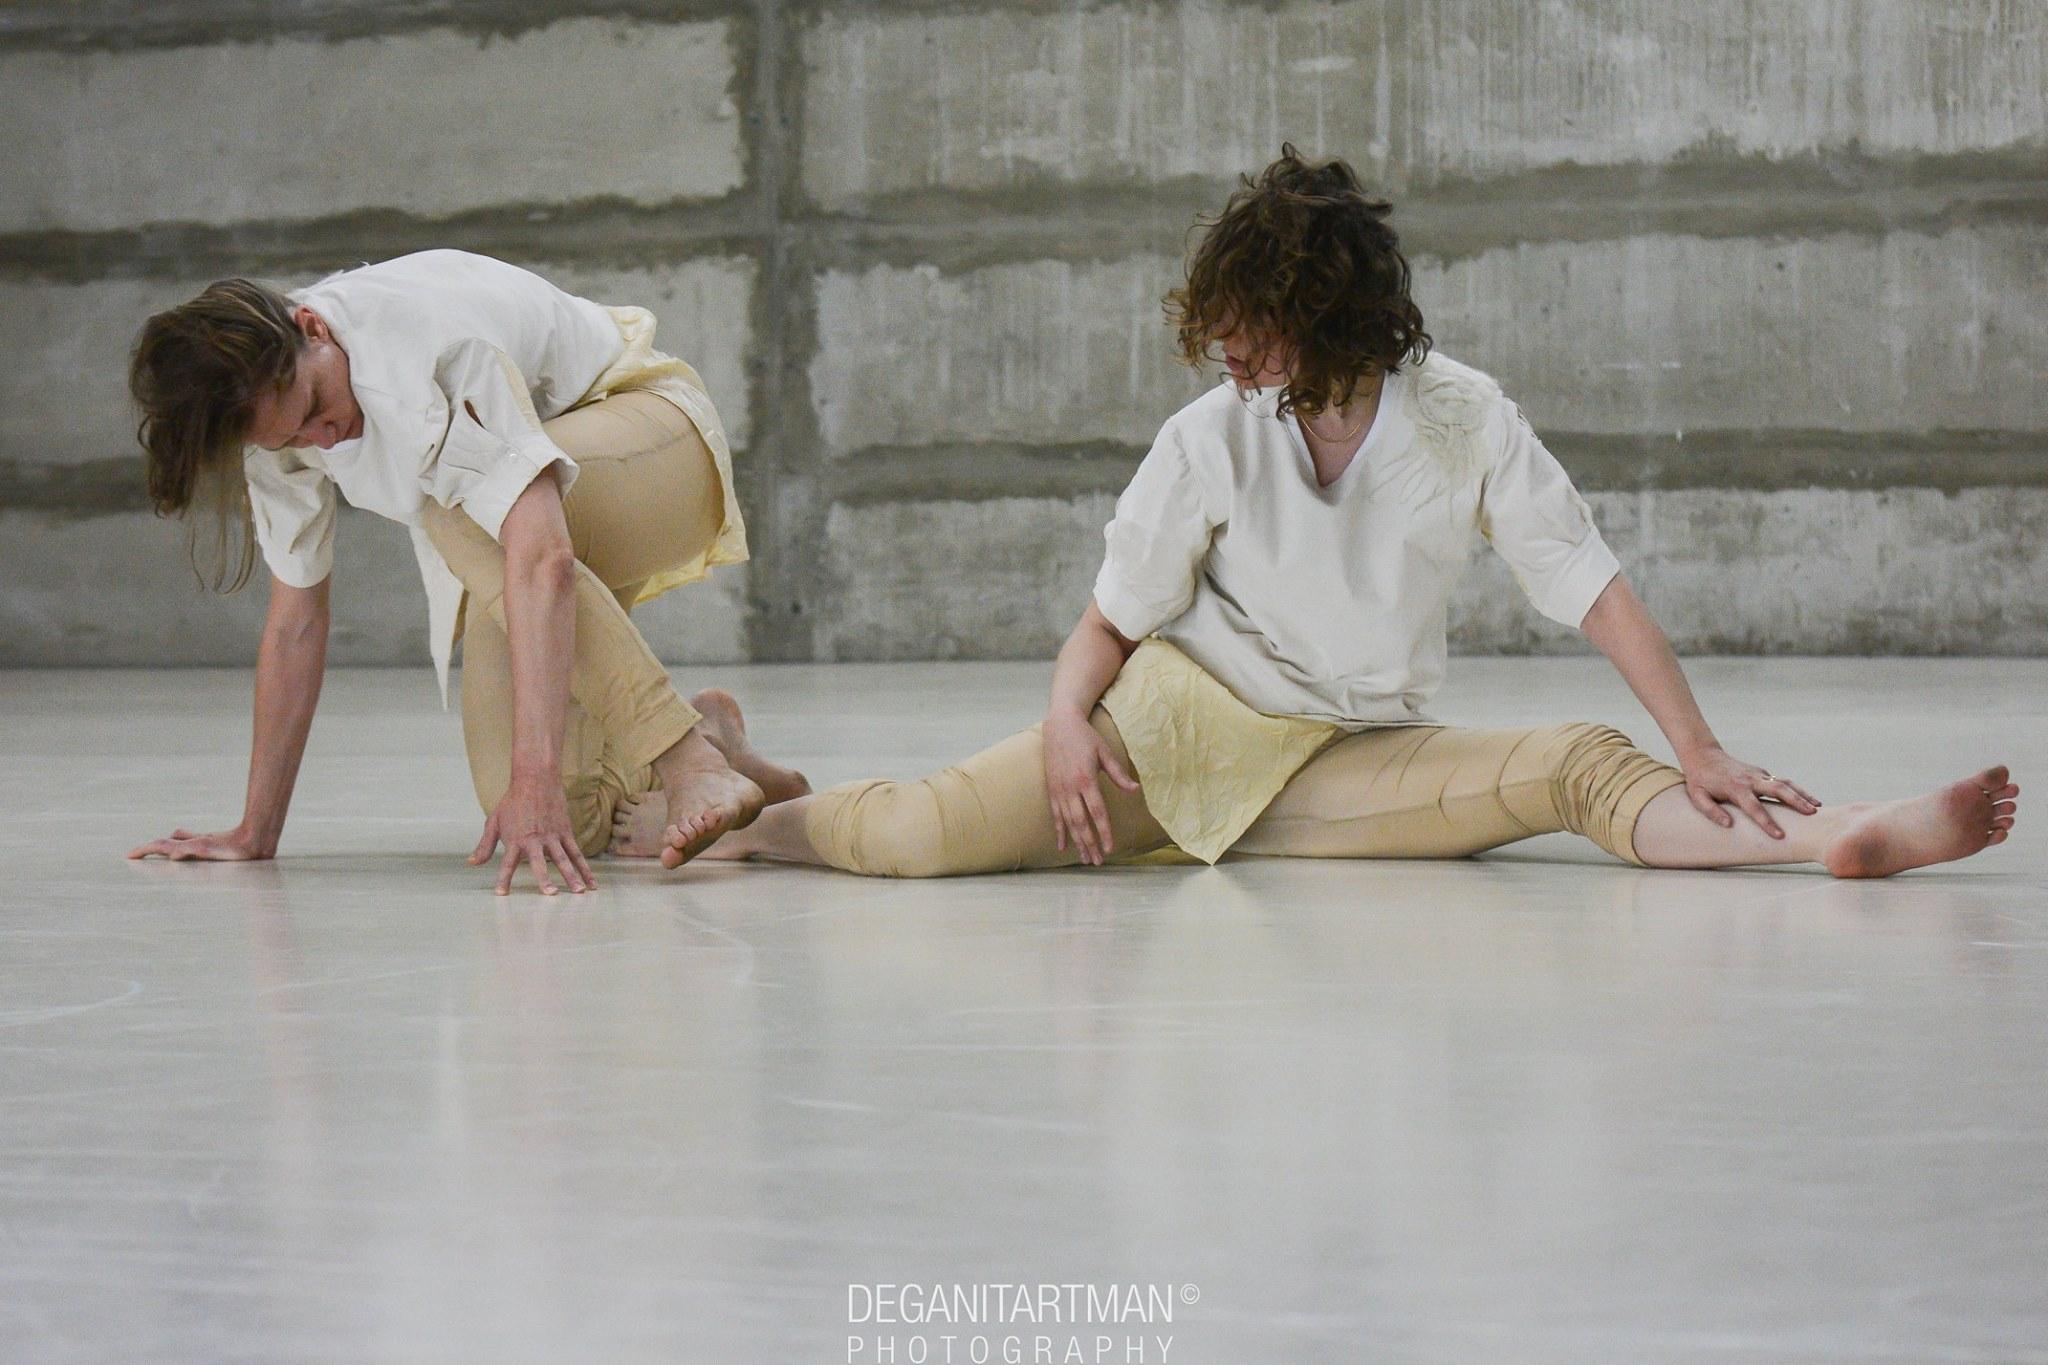 2her - Choreographed by Ayala Frenkel 2016.A duet performed by Ayala Frenkel & Noah Shavit.